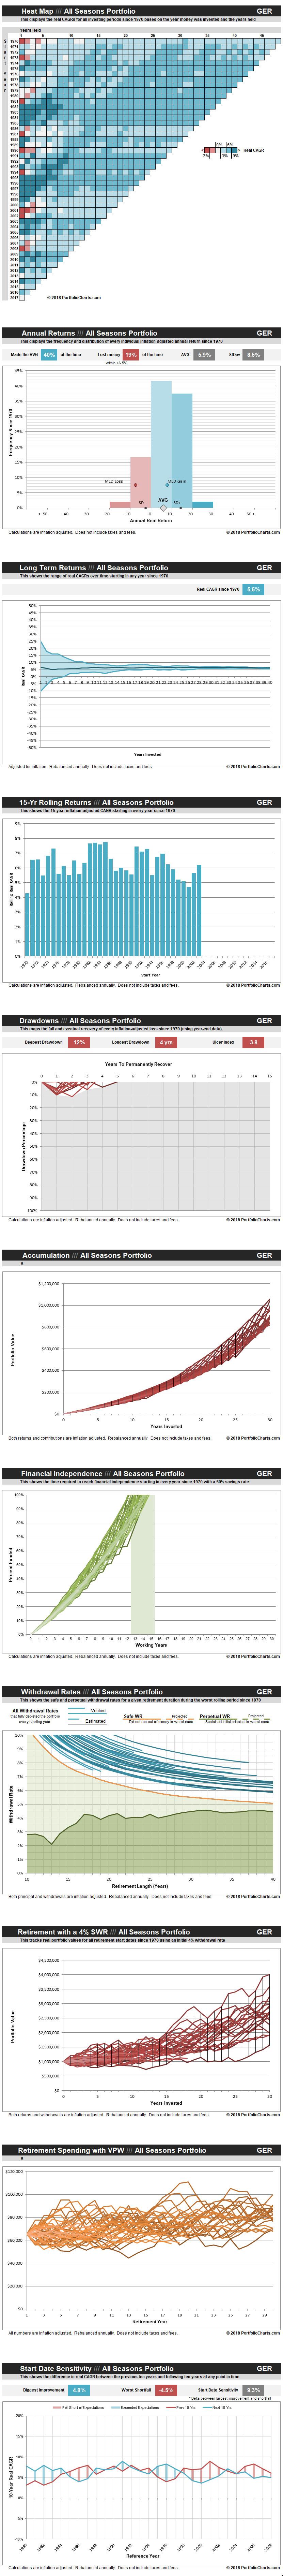 all-seasons-portfolio-GER-20180508